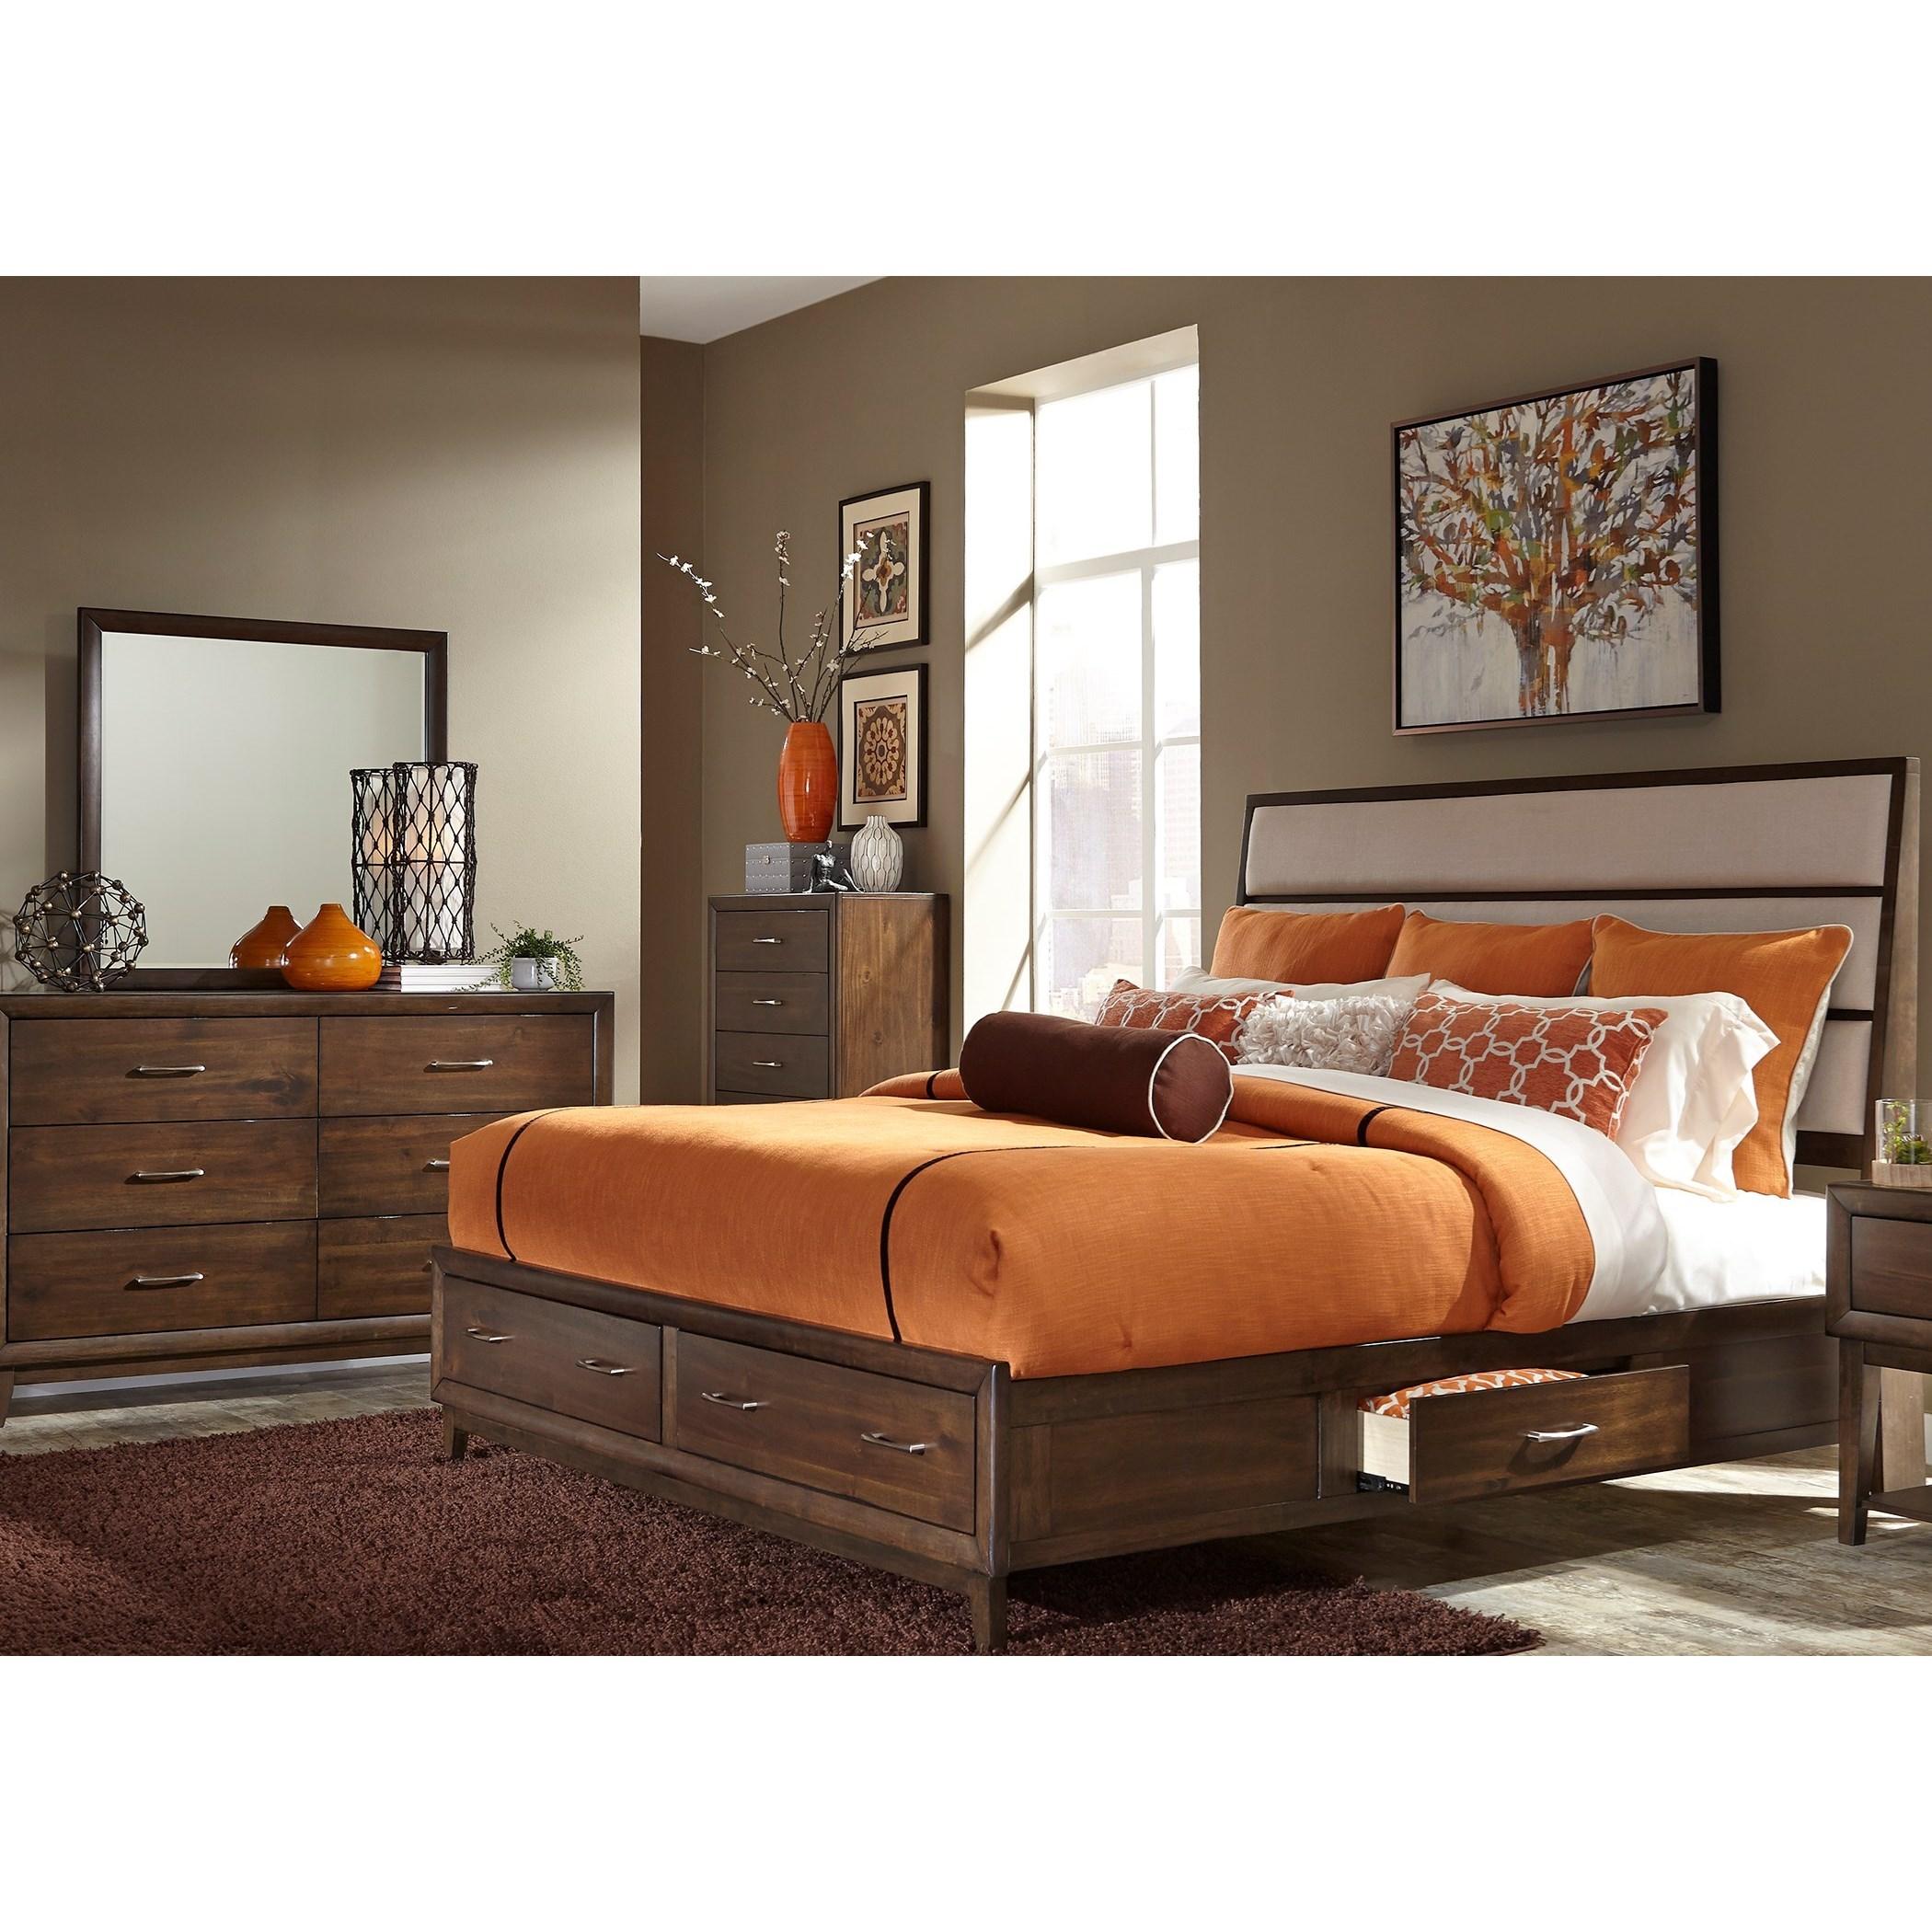 Liberty Furniture Hudson Square Bedroom Queen Bedroom Group - Item Number: 365-BR-Q2SDMC